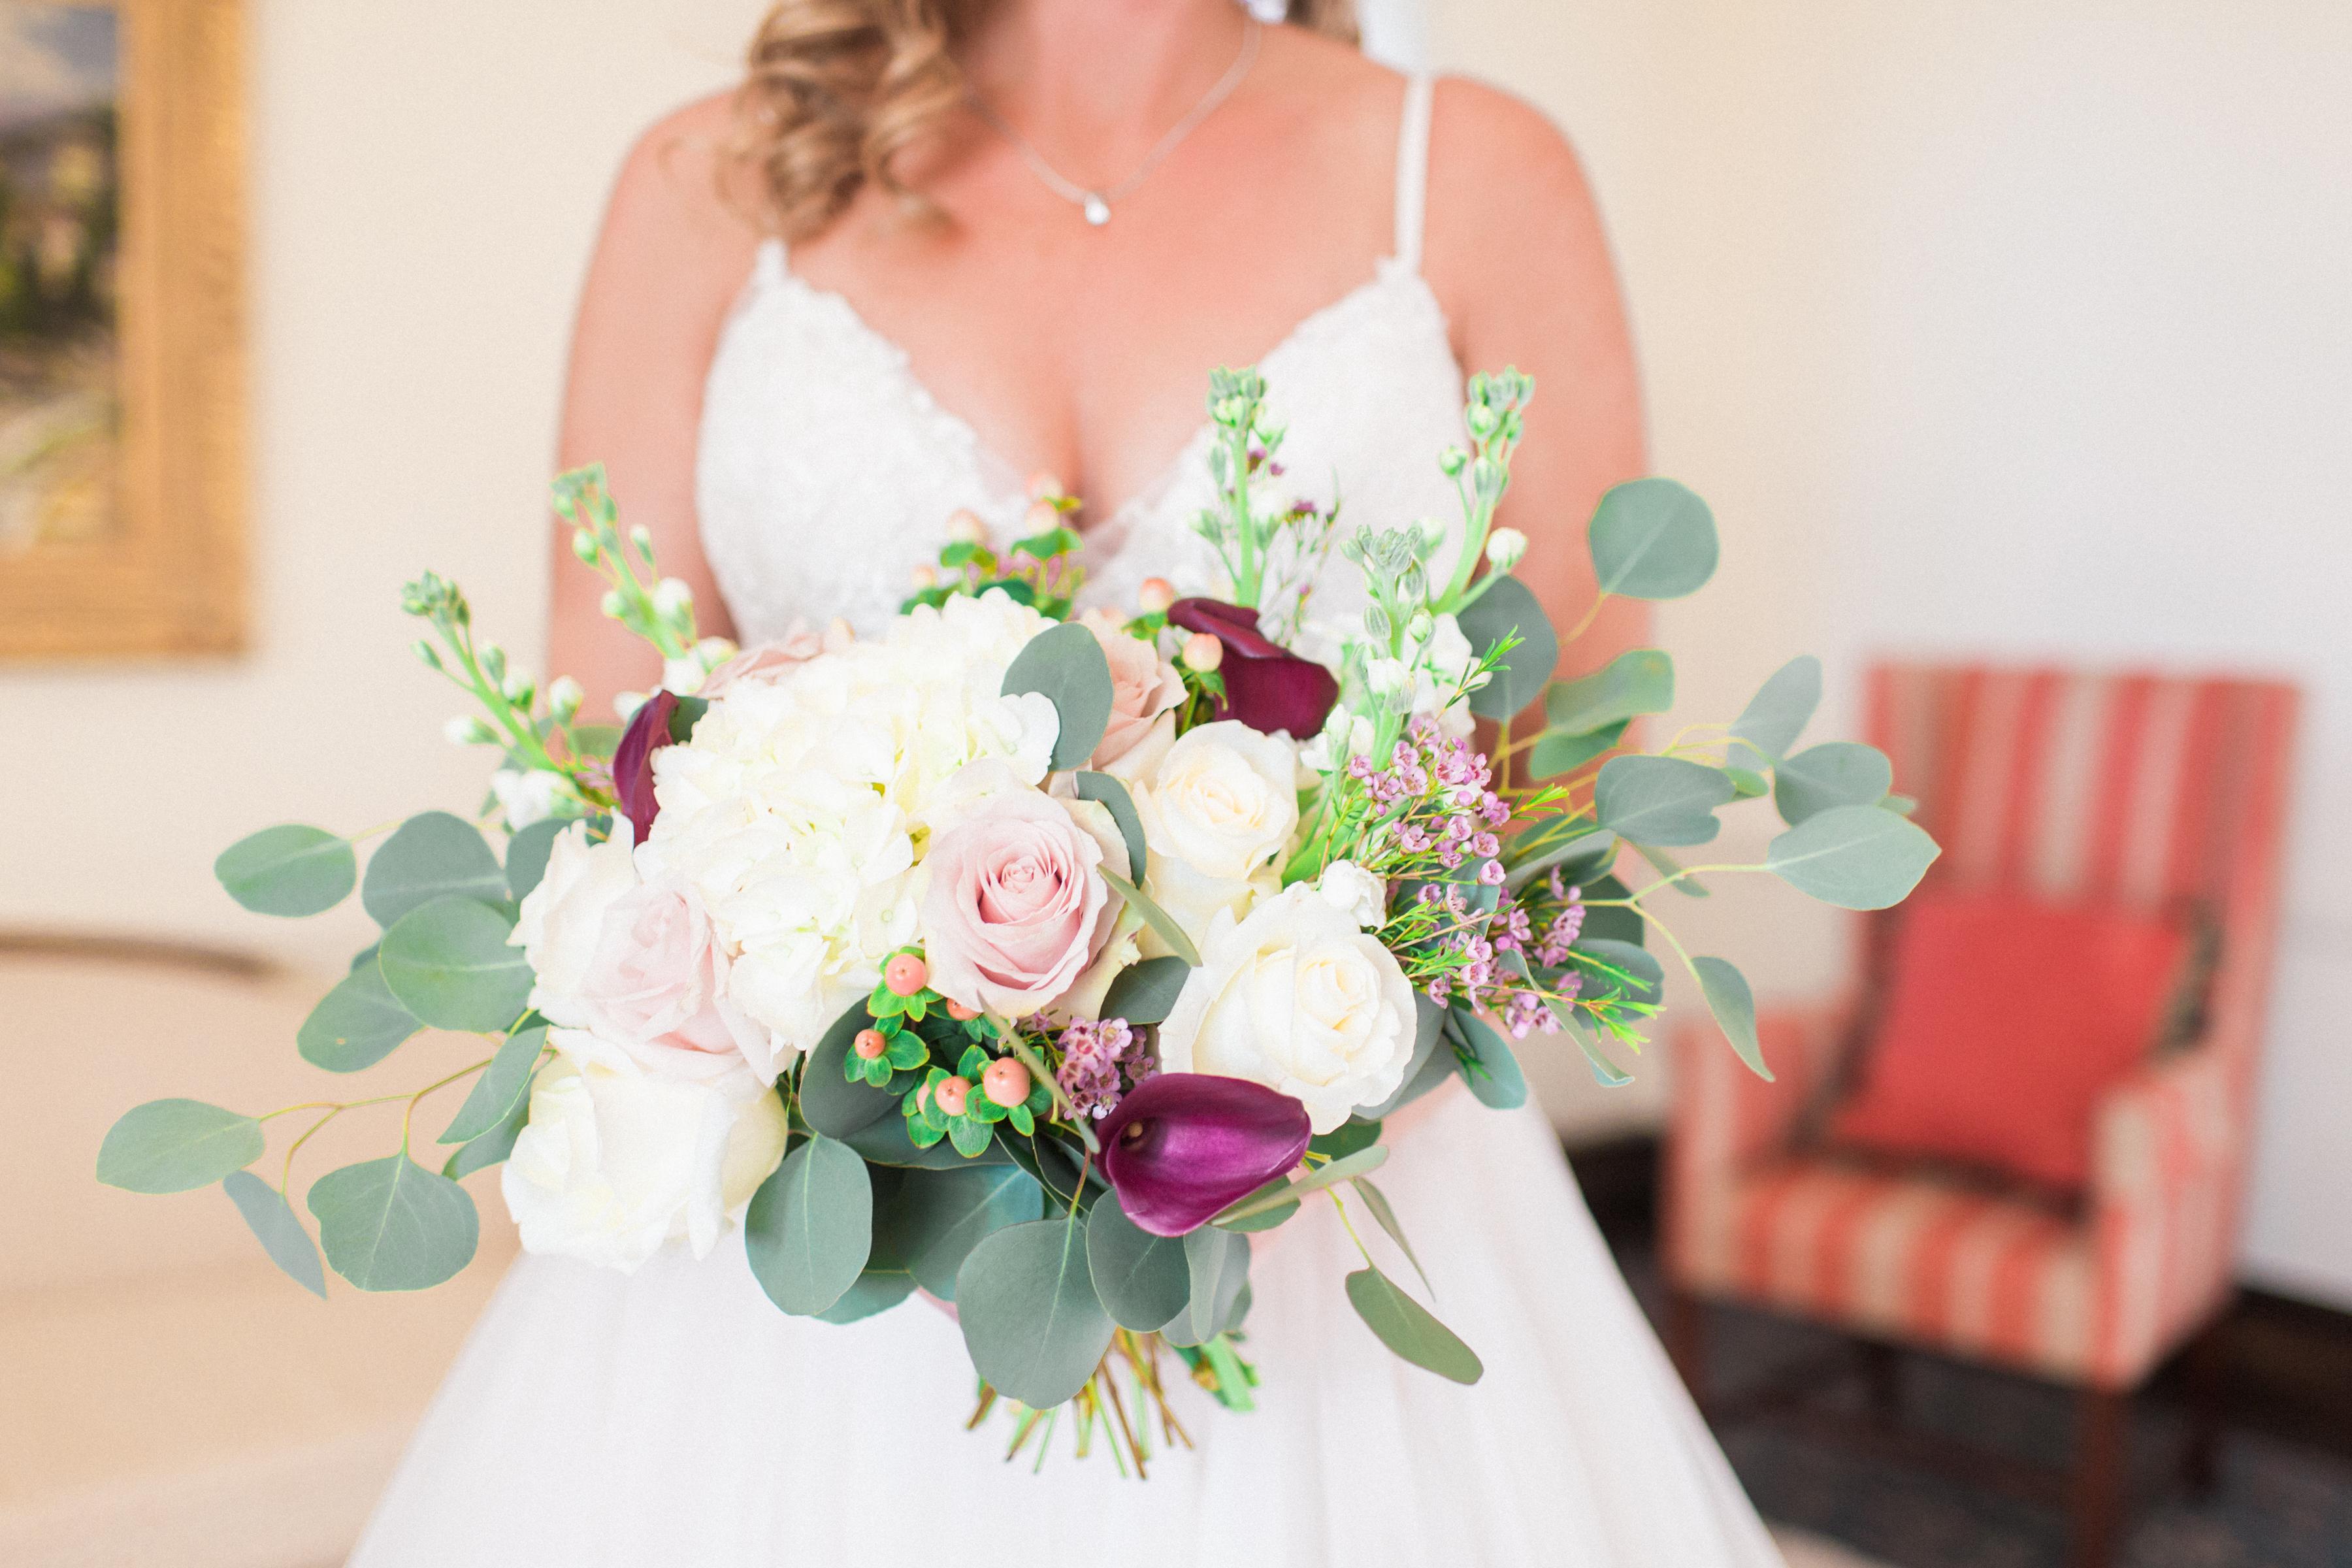 bridal bouquet, blush, white, burgundy